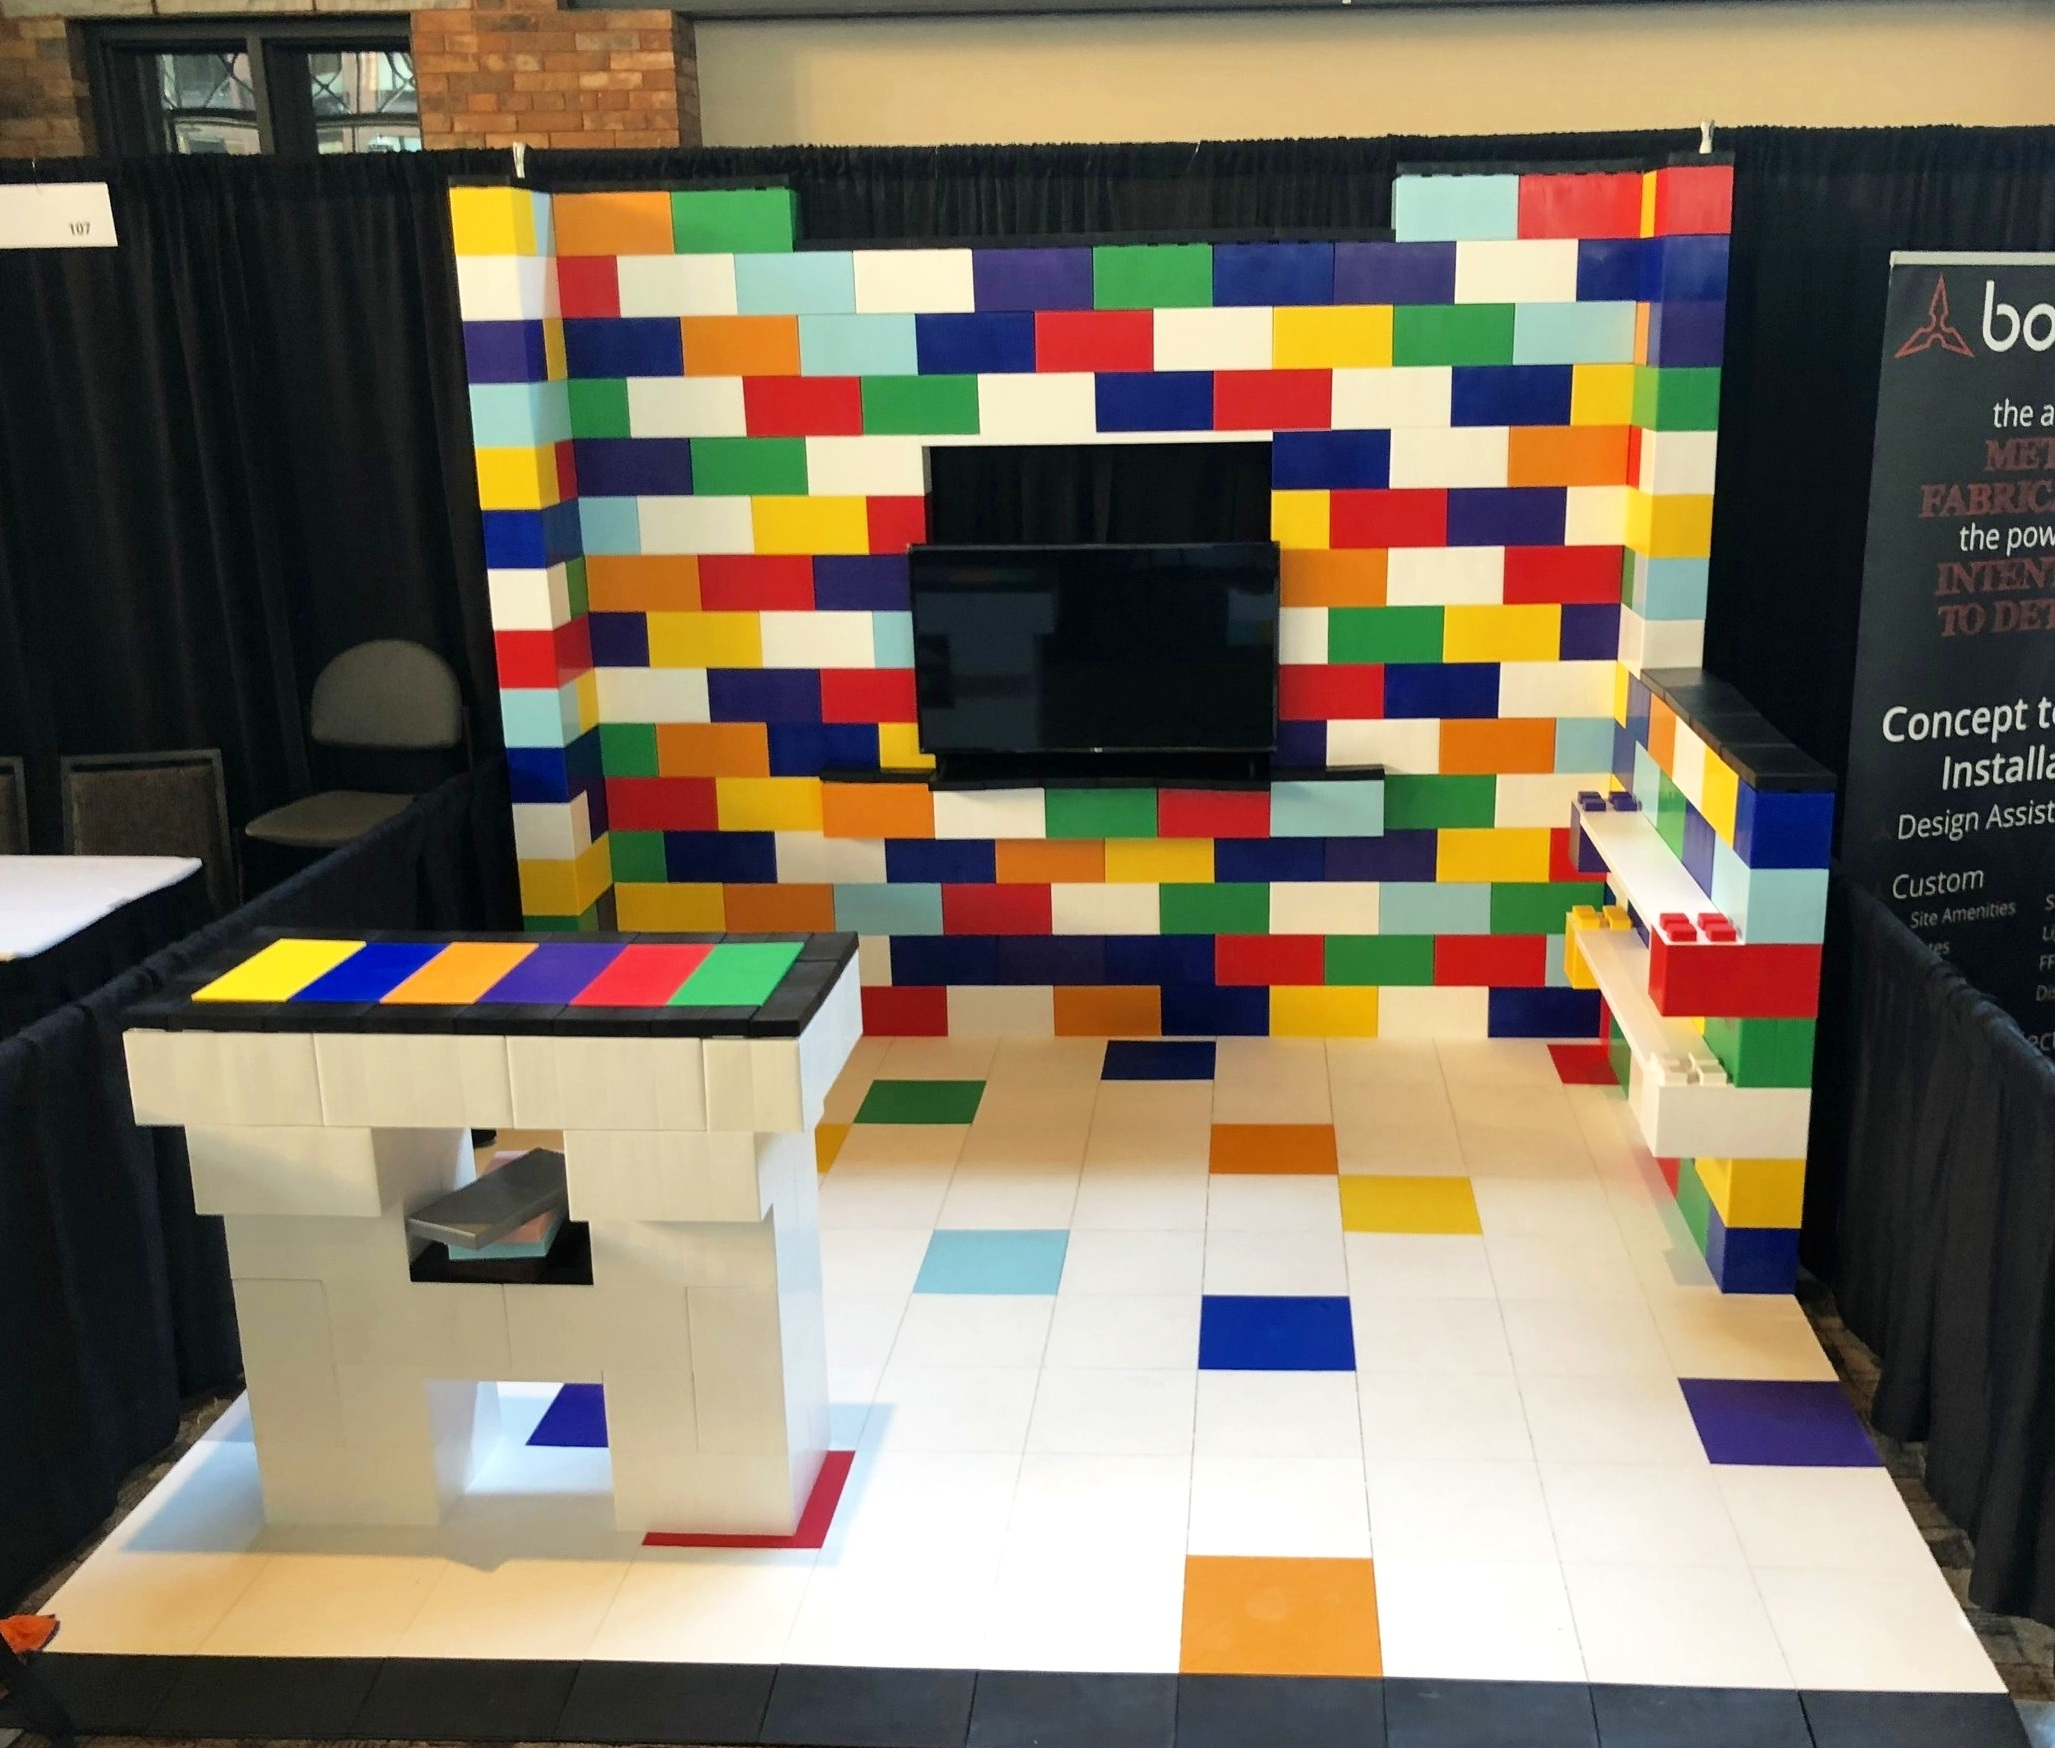 Exhibit Floors / Display Floors